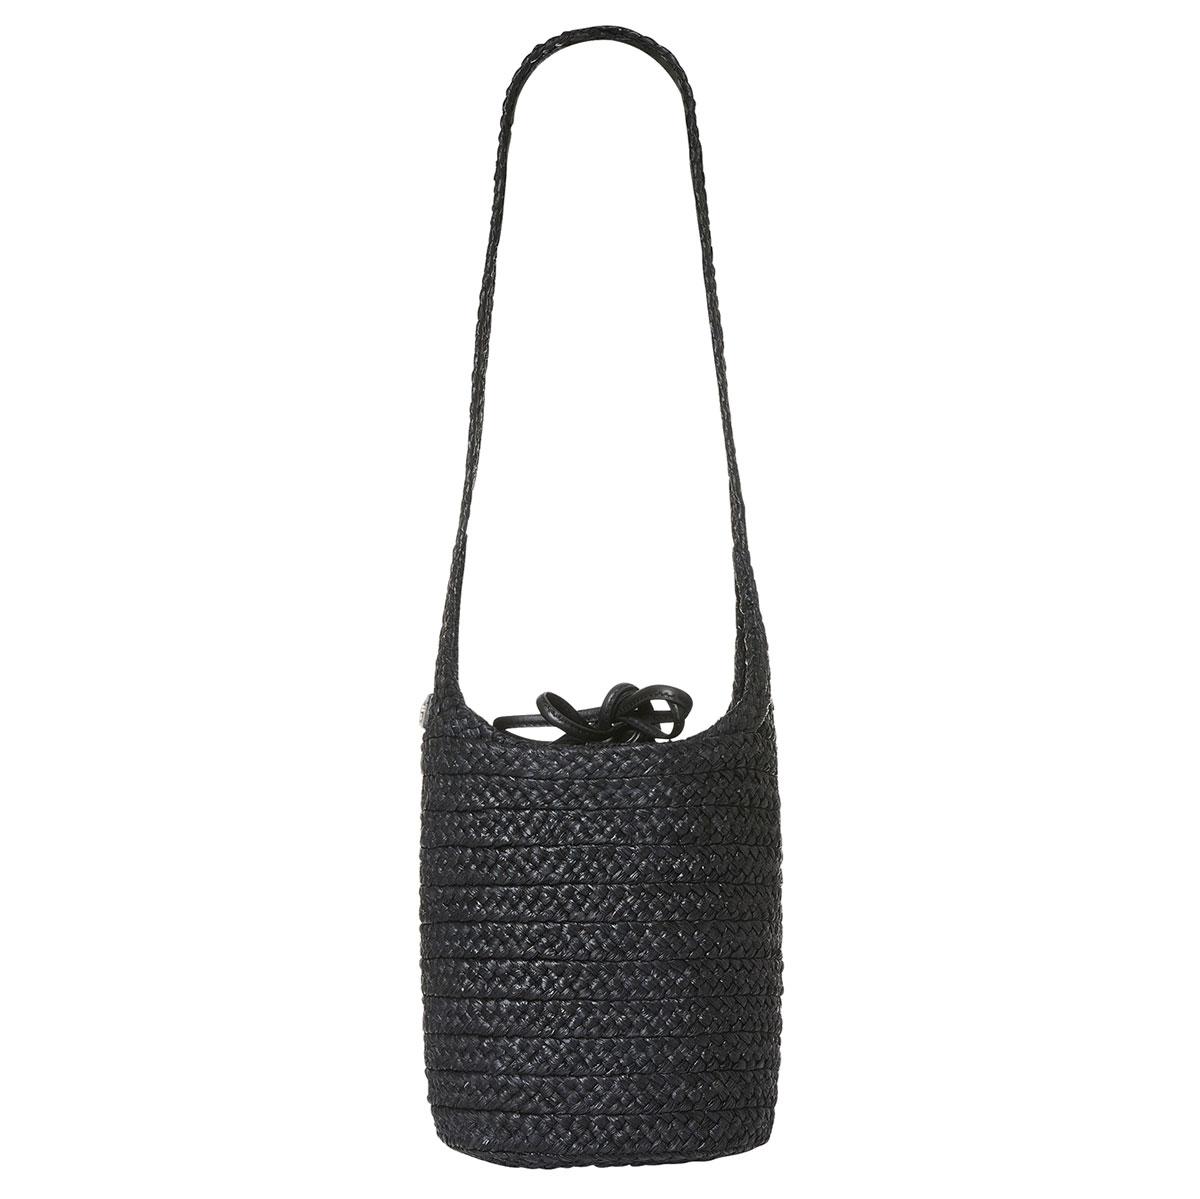 Helen Kaminski Camarillo Small Bridle Sac in Charcoal,Black